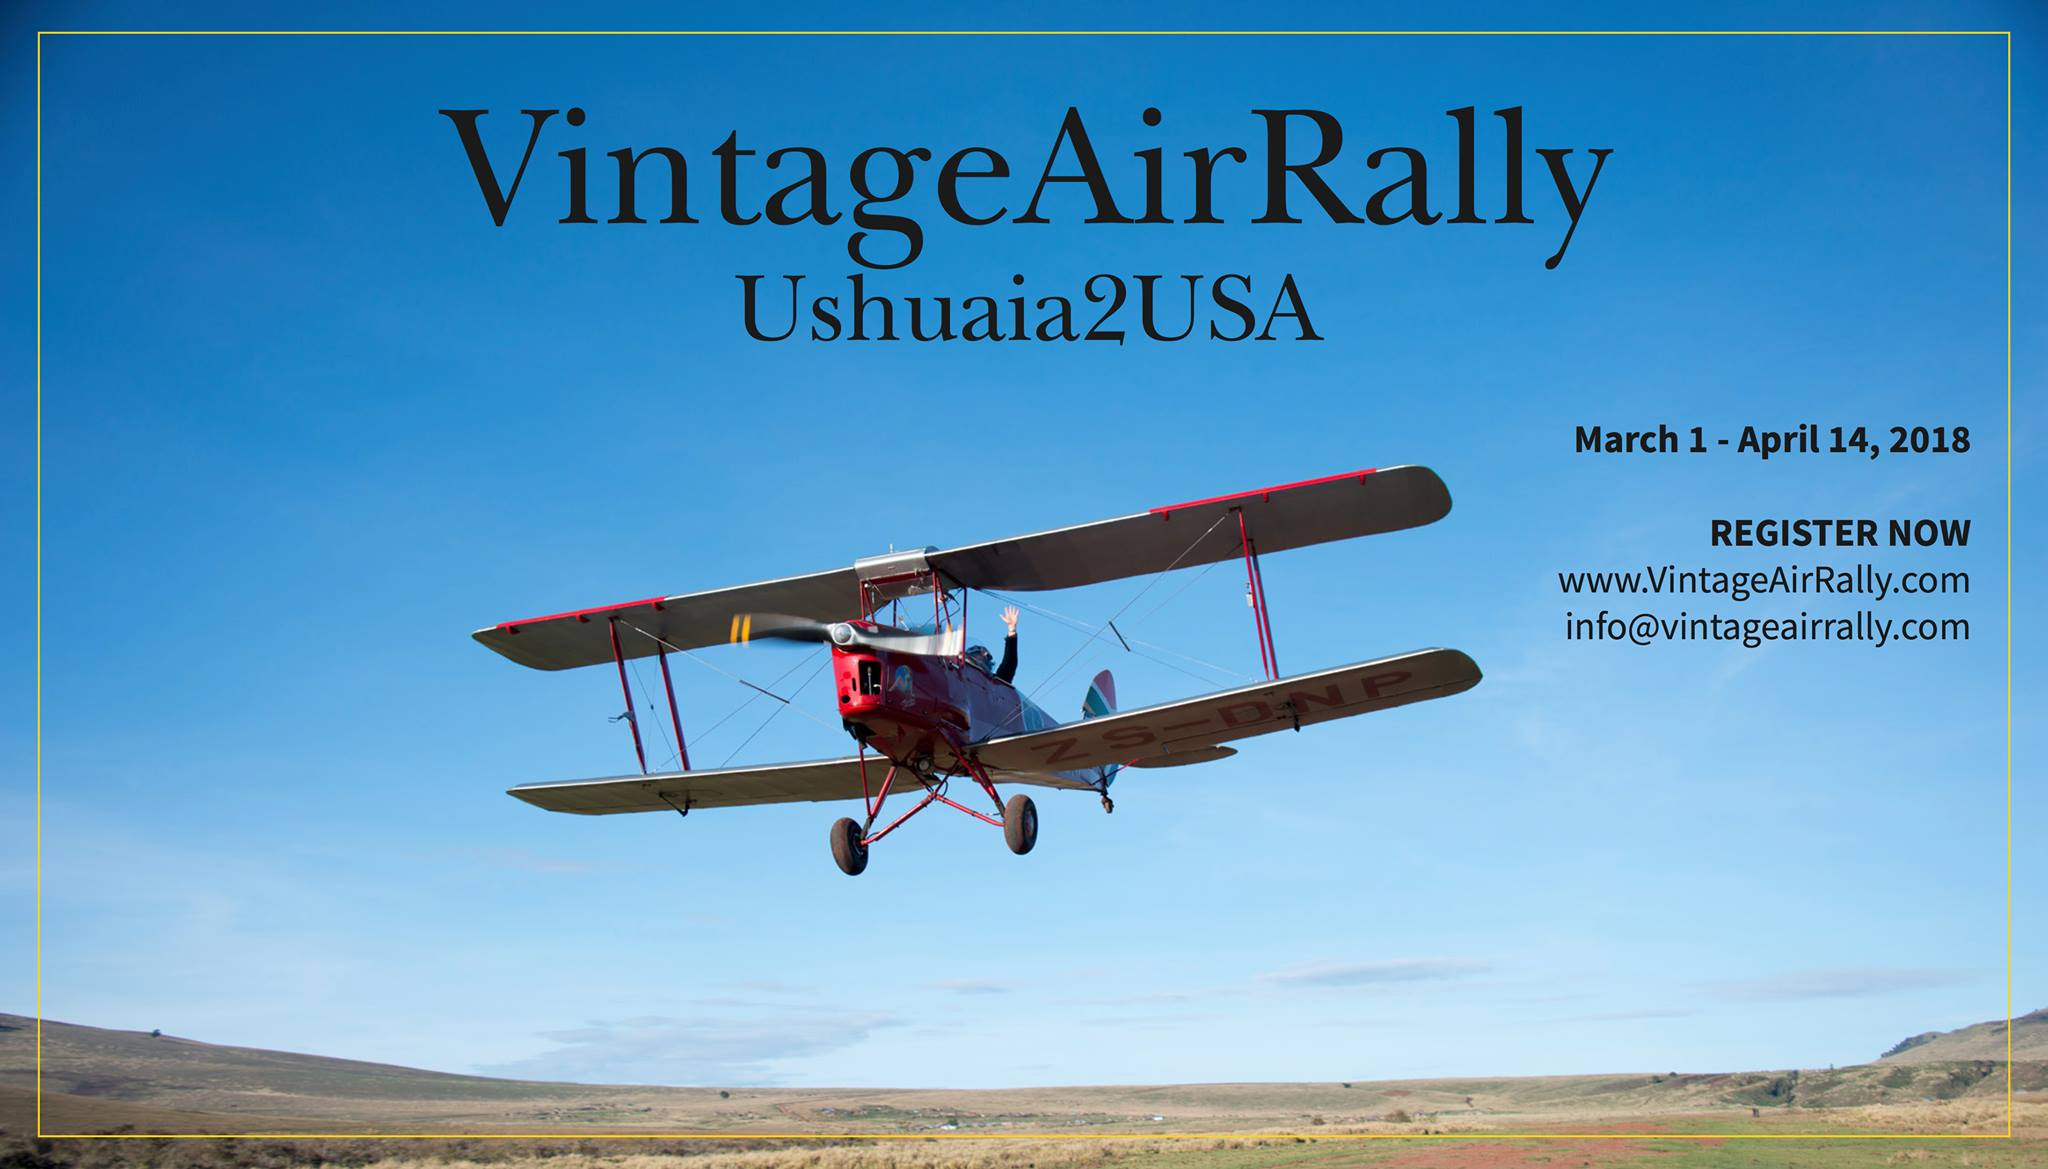 VIntage Air Rally1